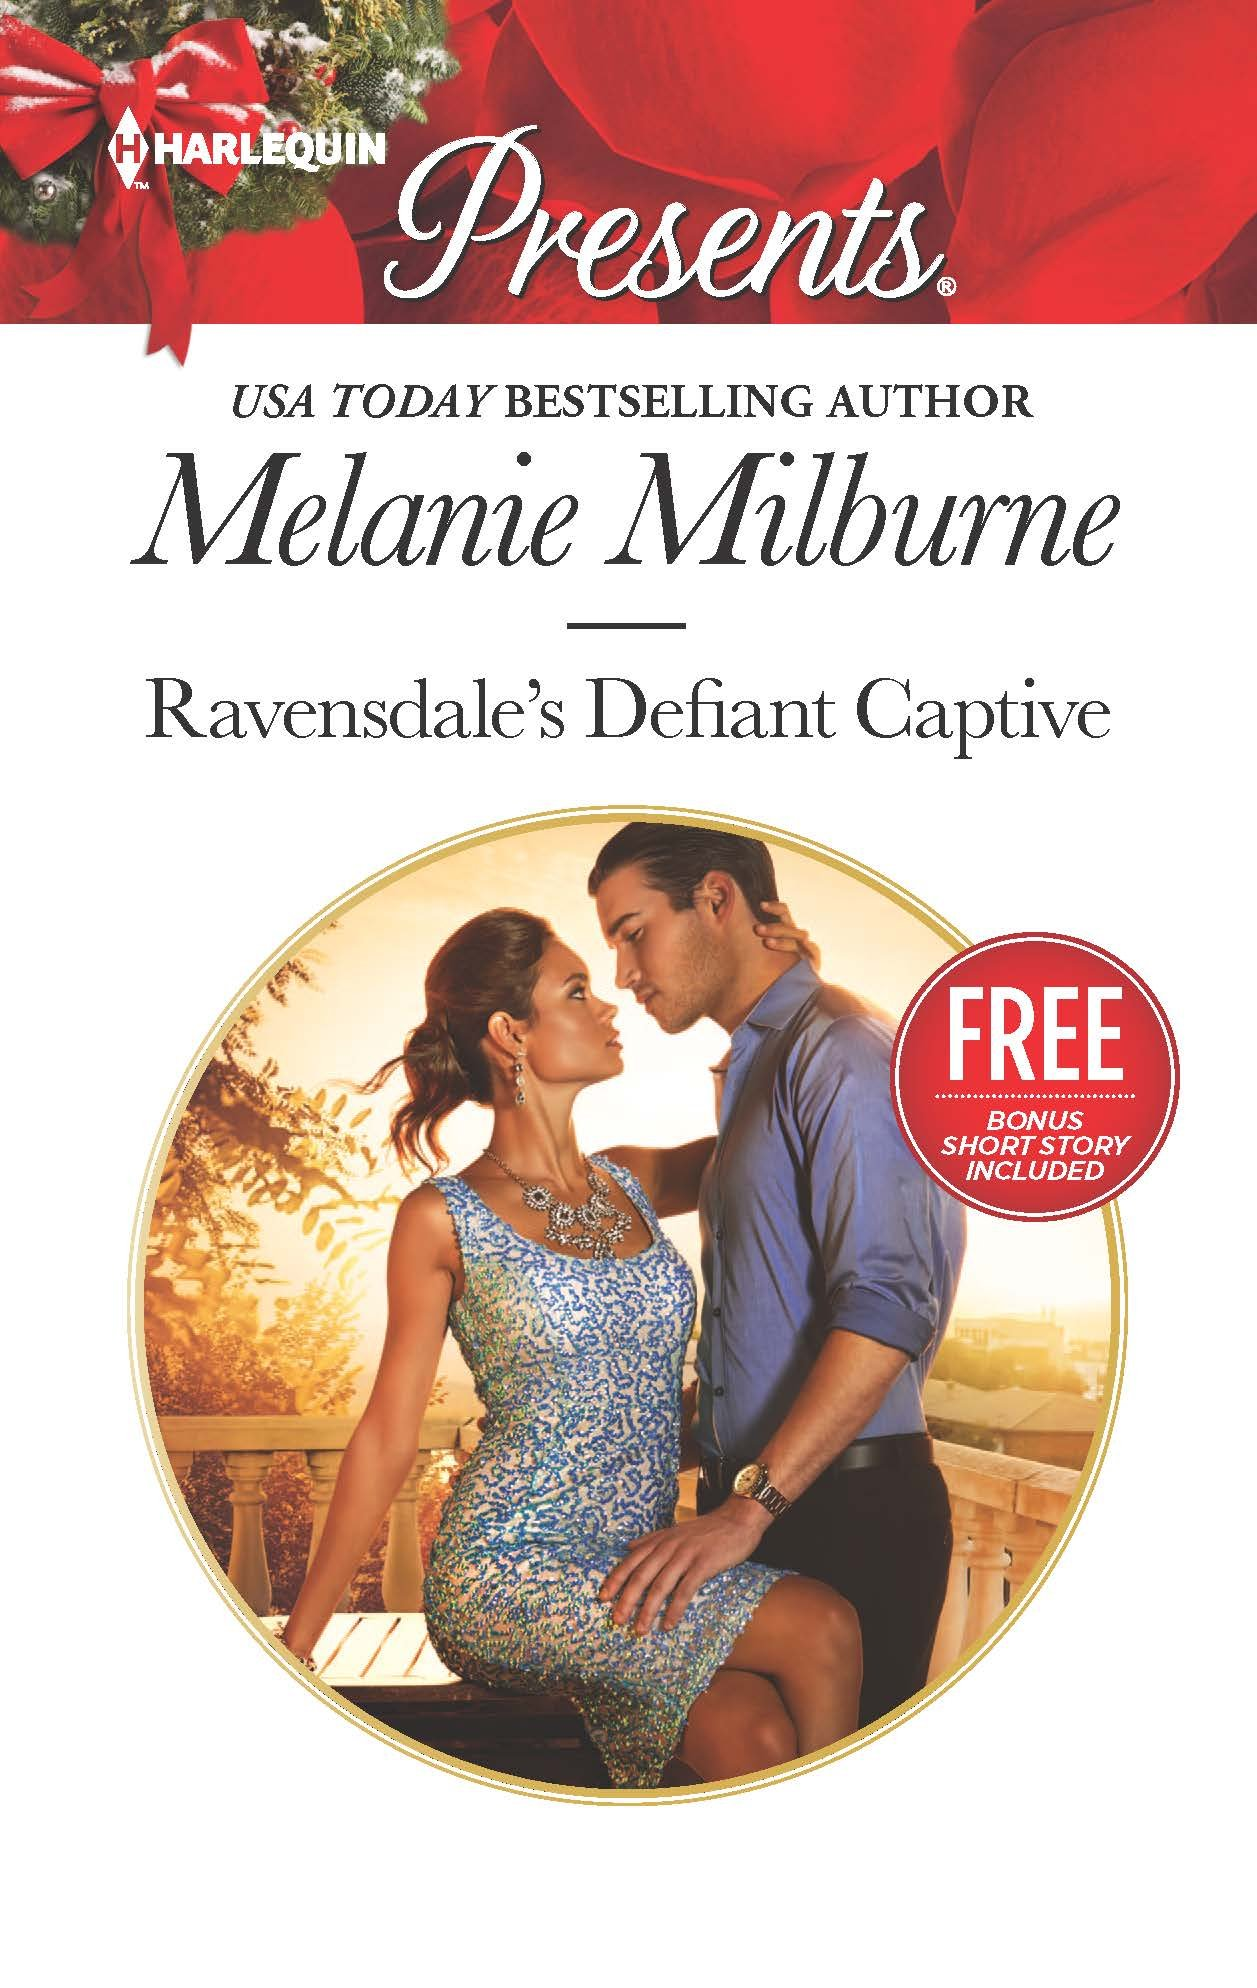 Ravensdale's Defiant Captive: An Anthology (The Ravensdale Scandals) ebook